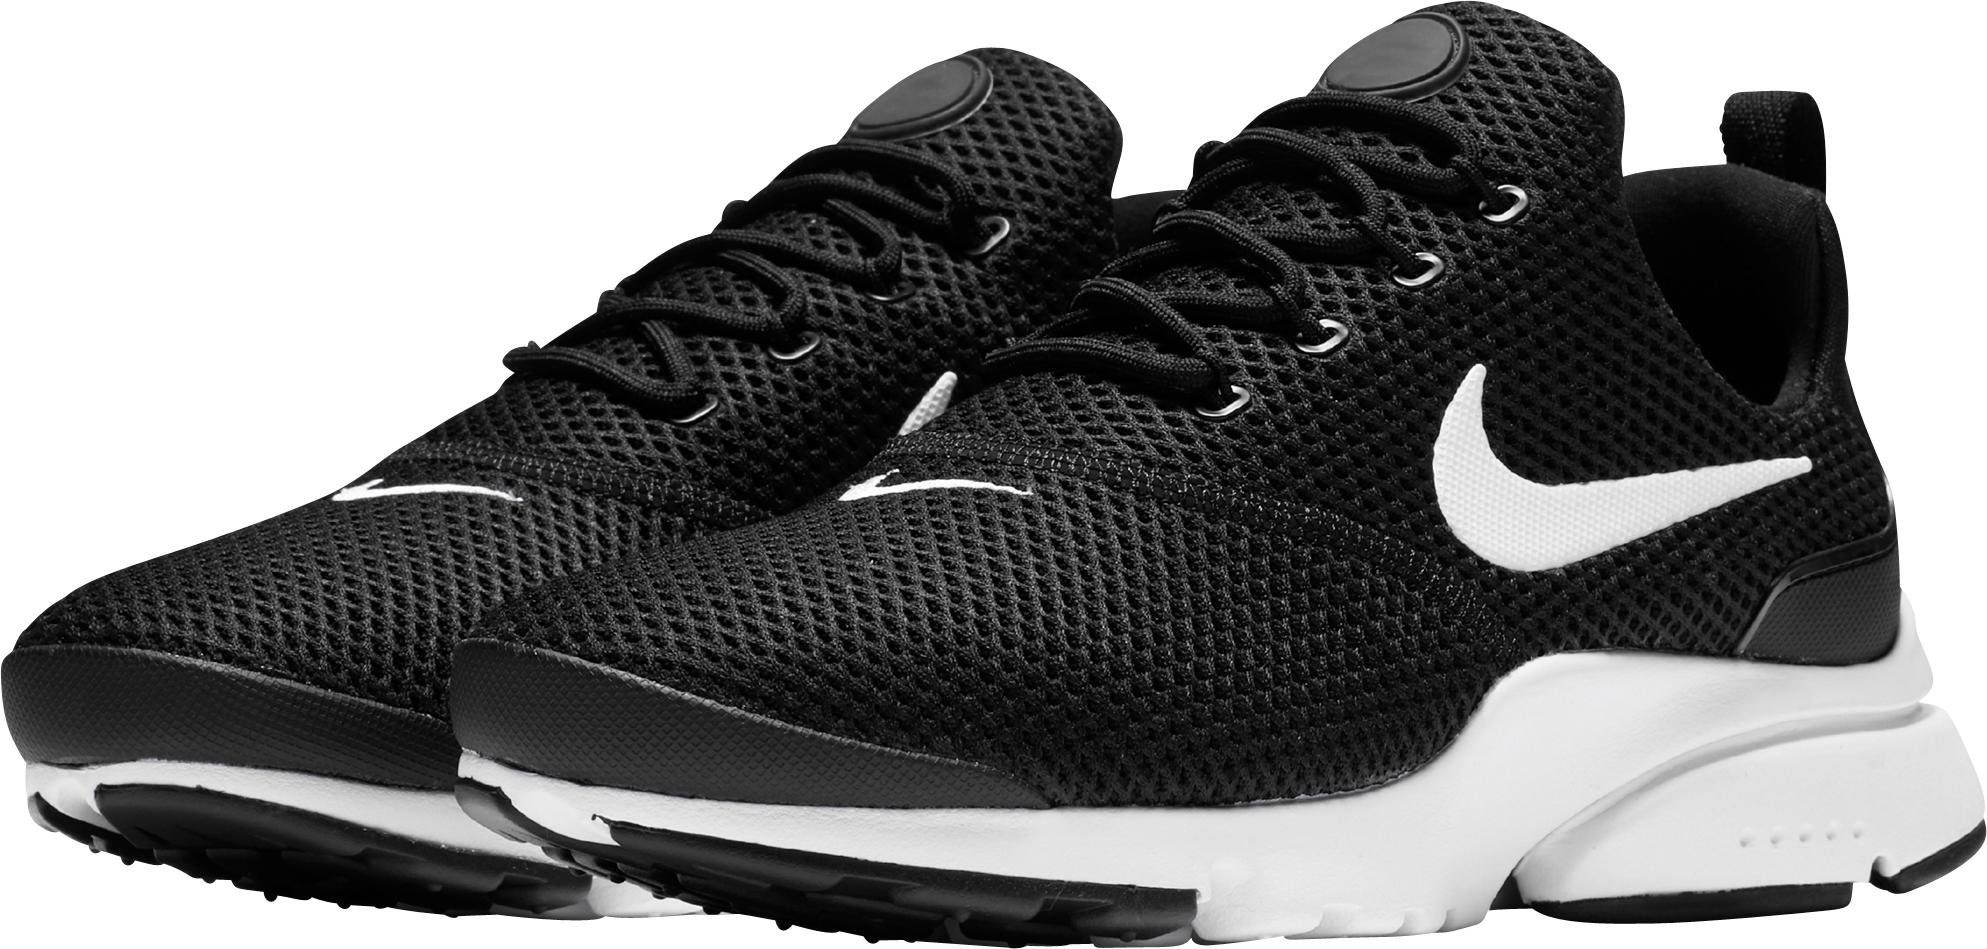 Nike Fly« kaufenOTTO Presto Sportswear »Wmns Sneaker cq354jLASR